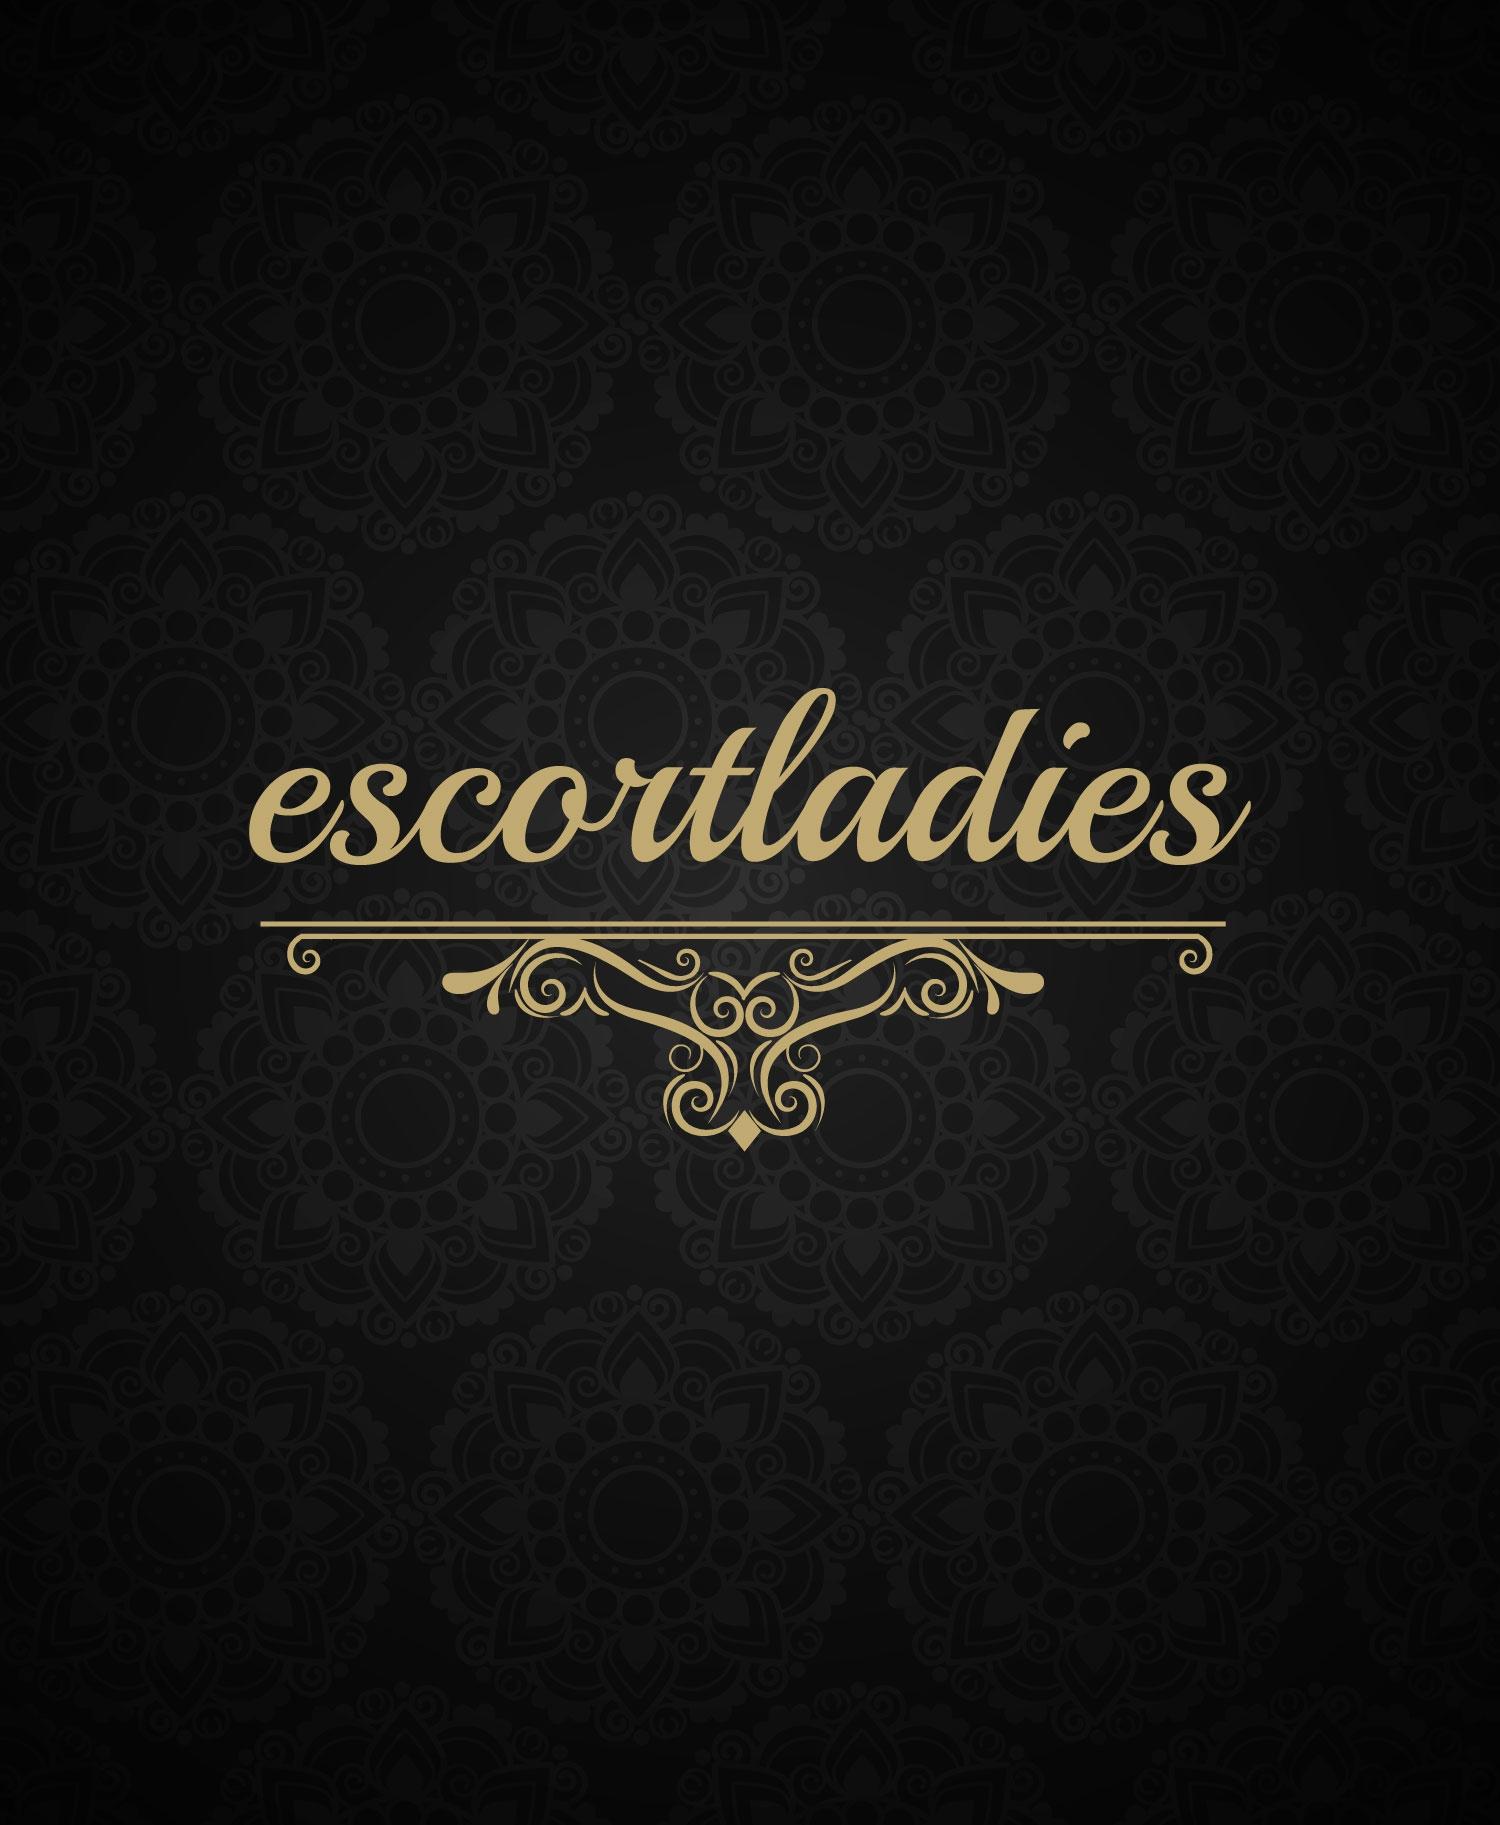 Elite Escort Agency Escortladies in Athens